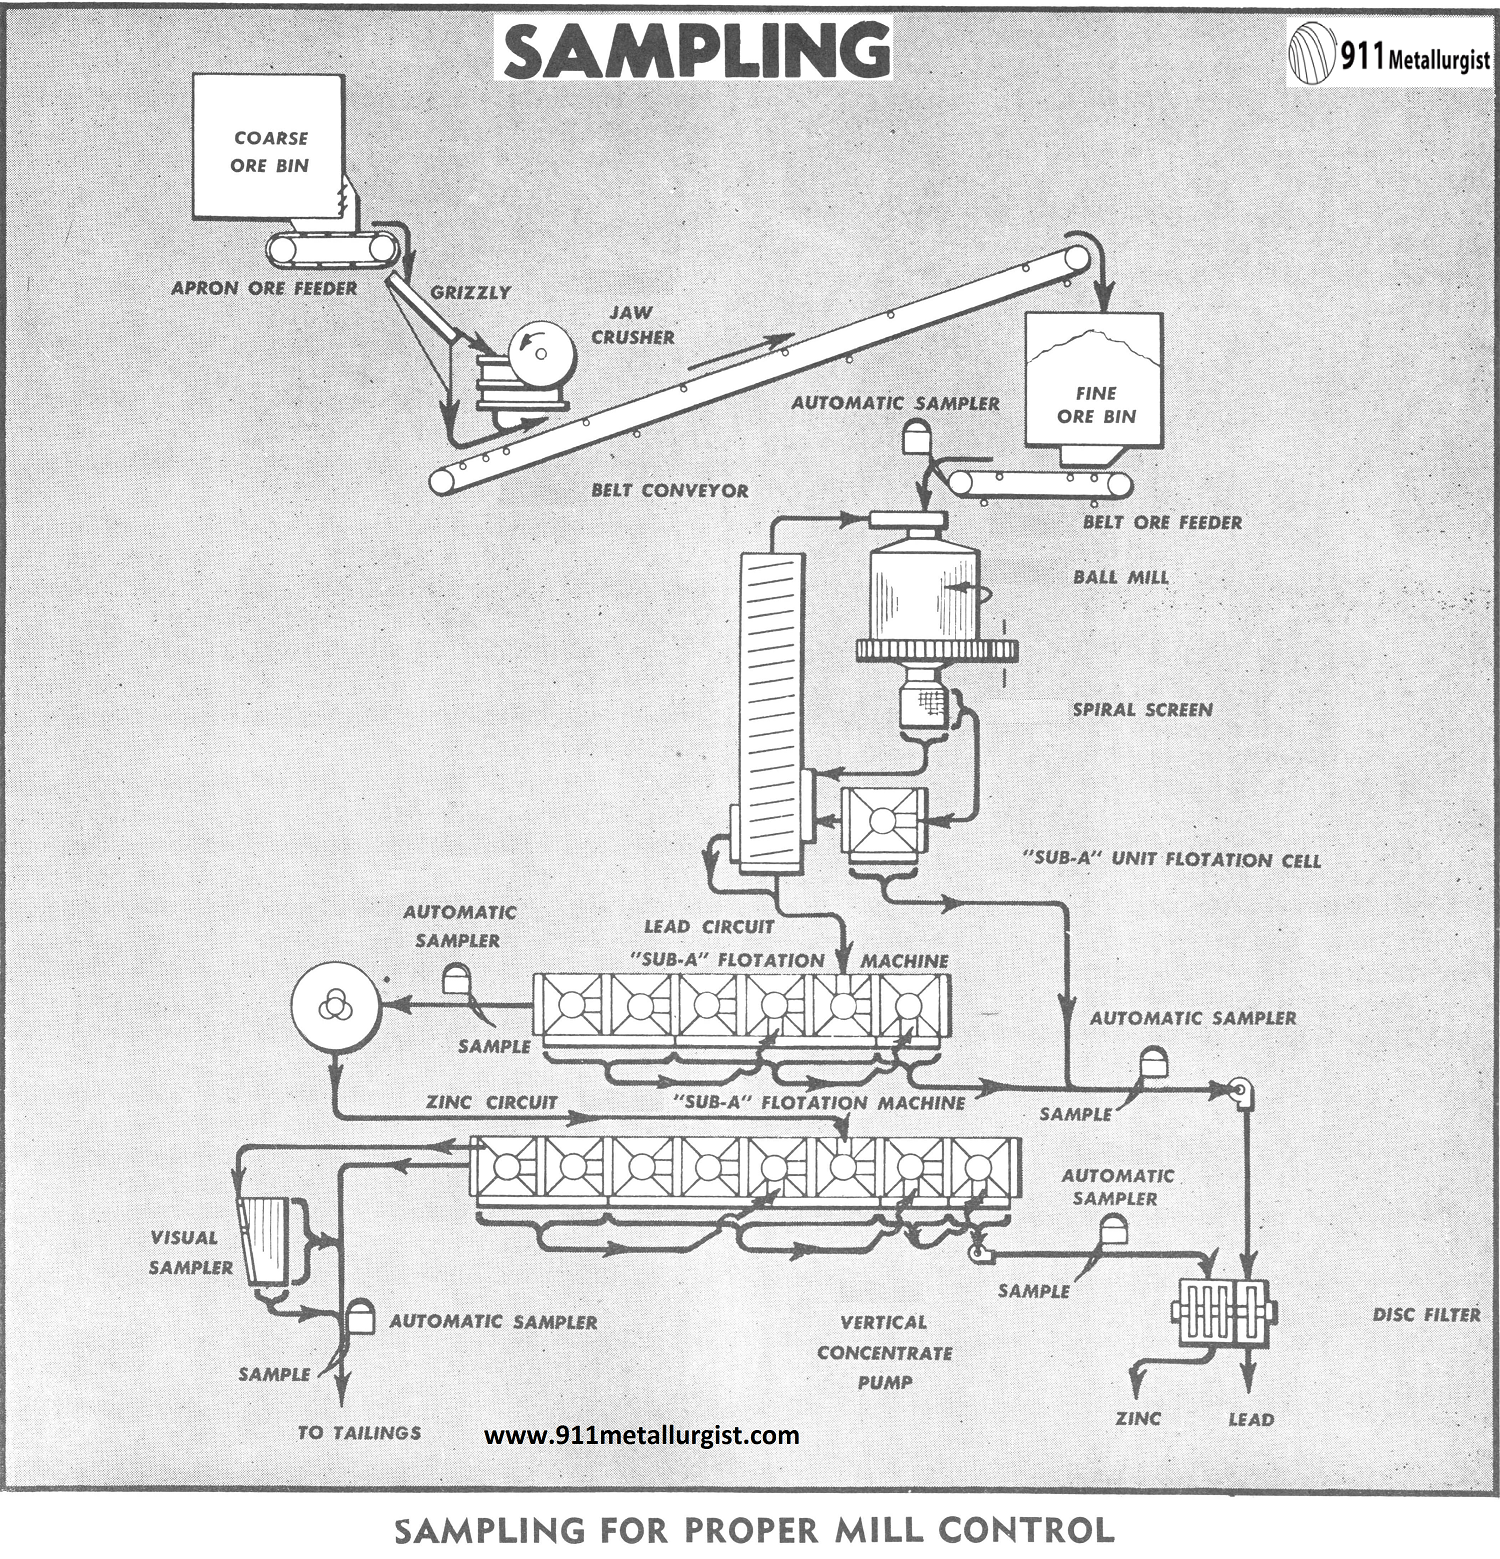 Sampling for Proper Mill Control